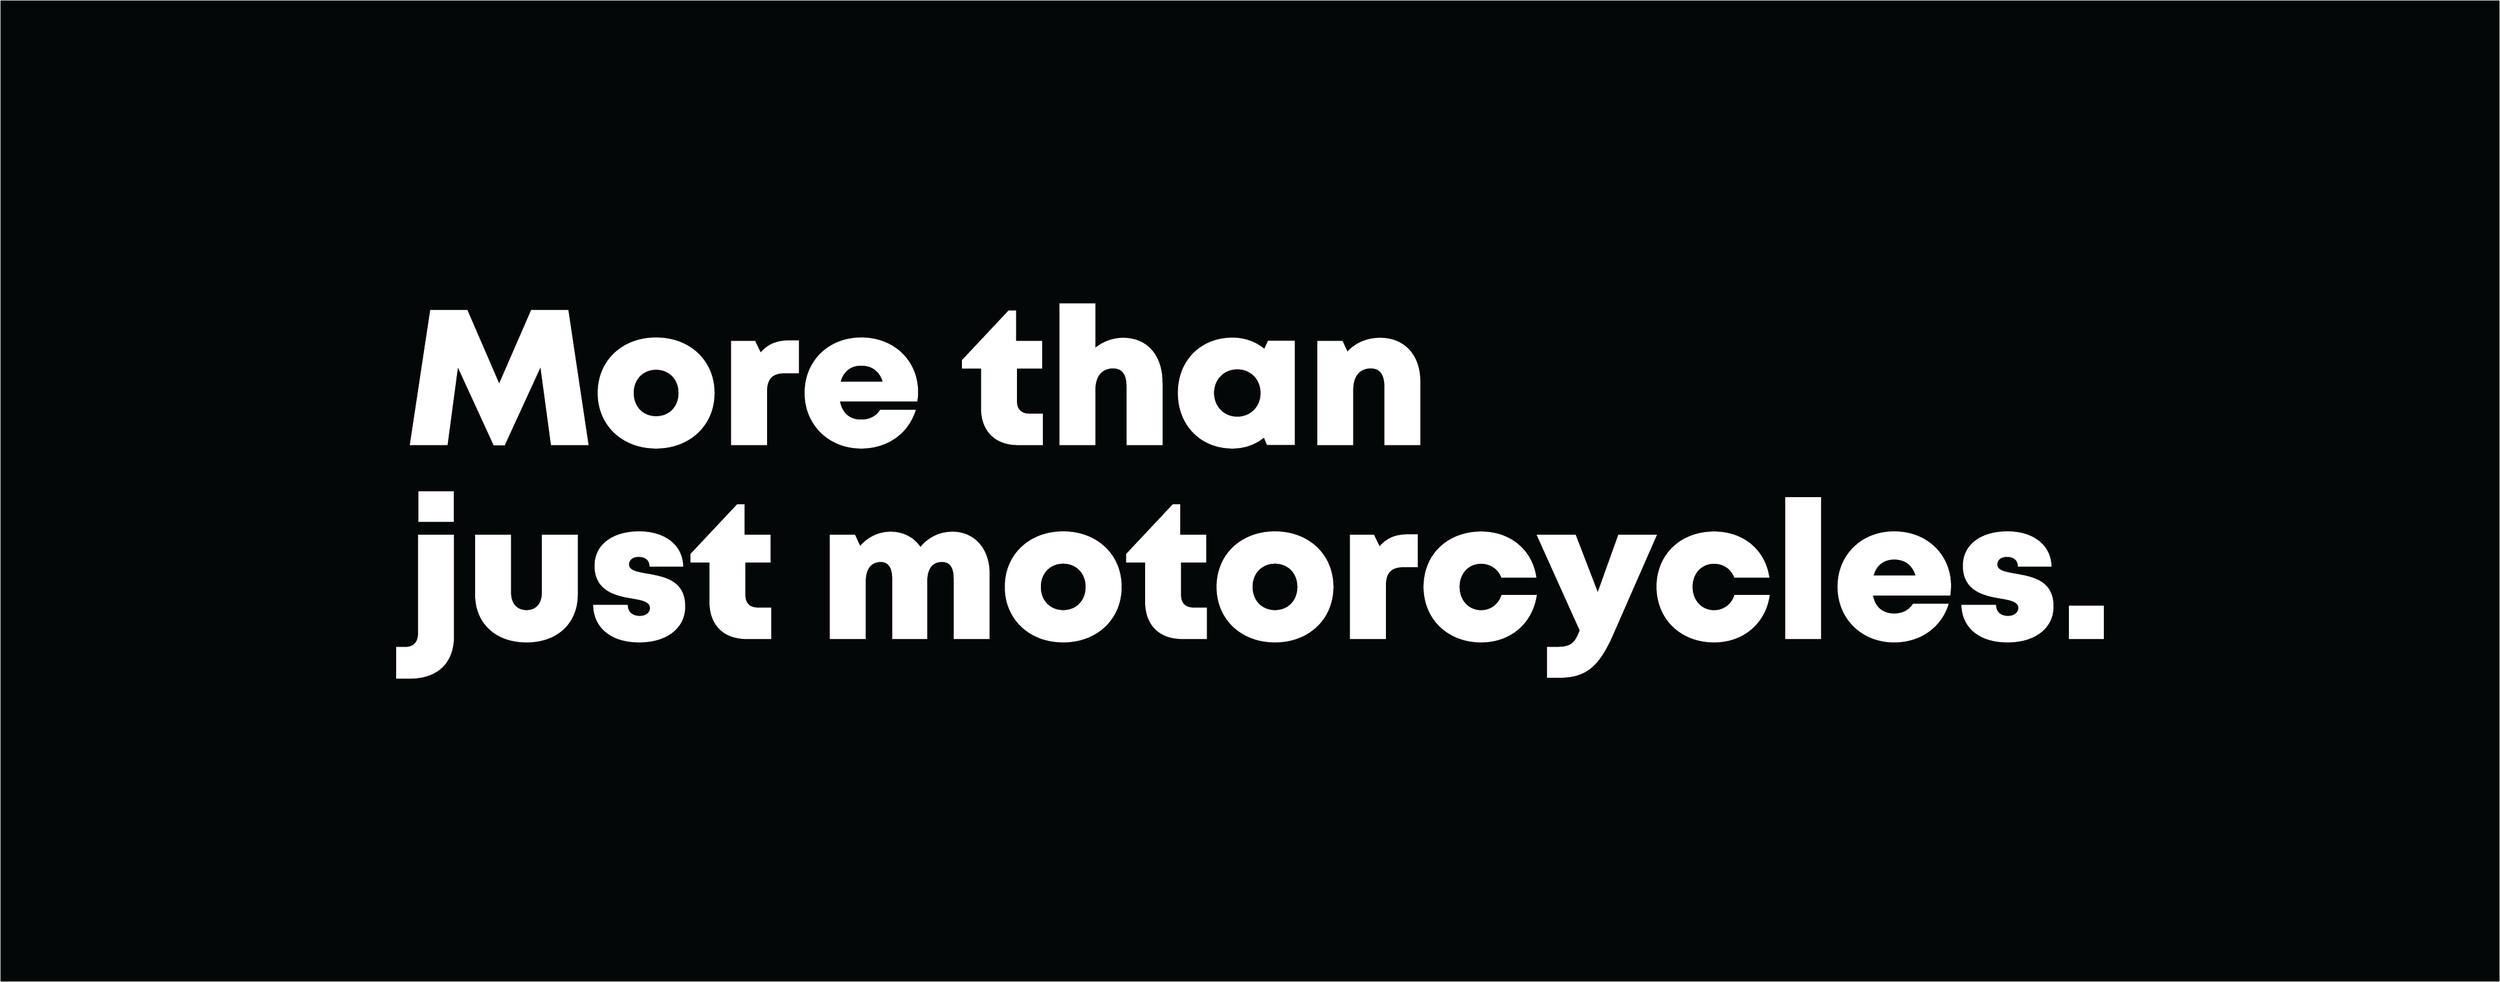 MoreThanJustMotorcycles-01.png